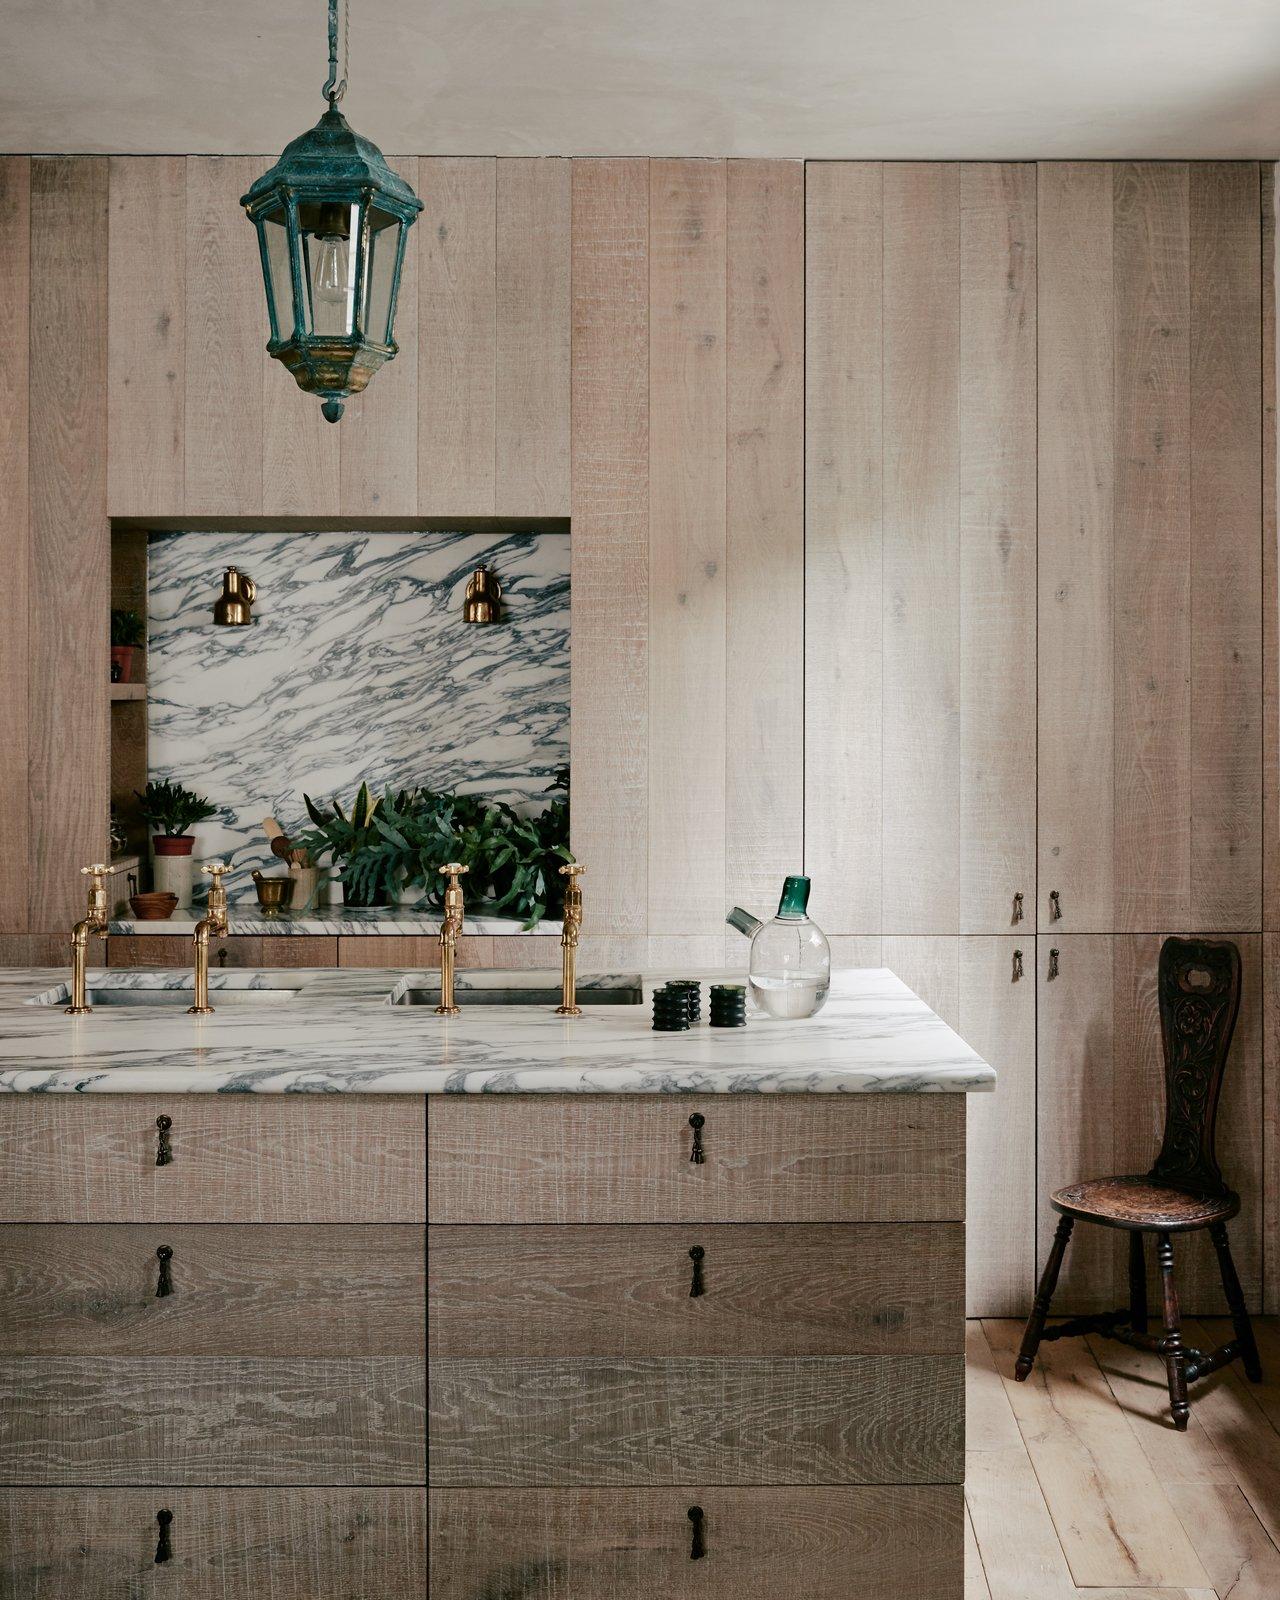 23 Kitchen Countertops That Serve Up Good Design